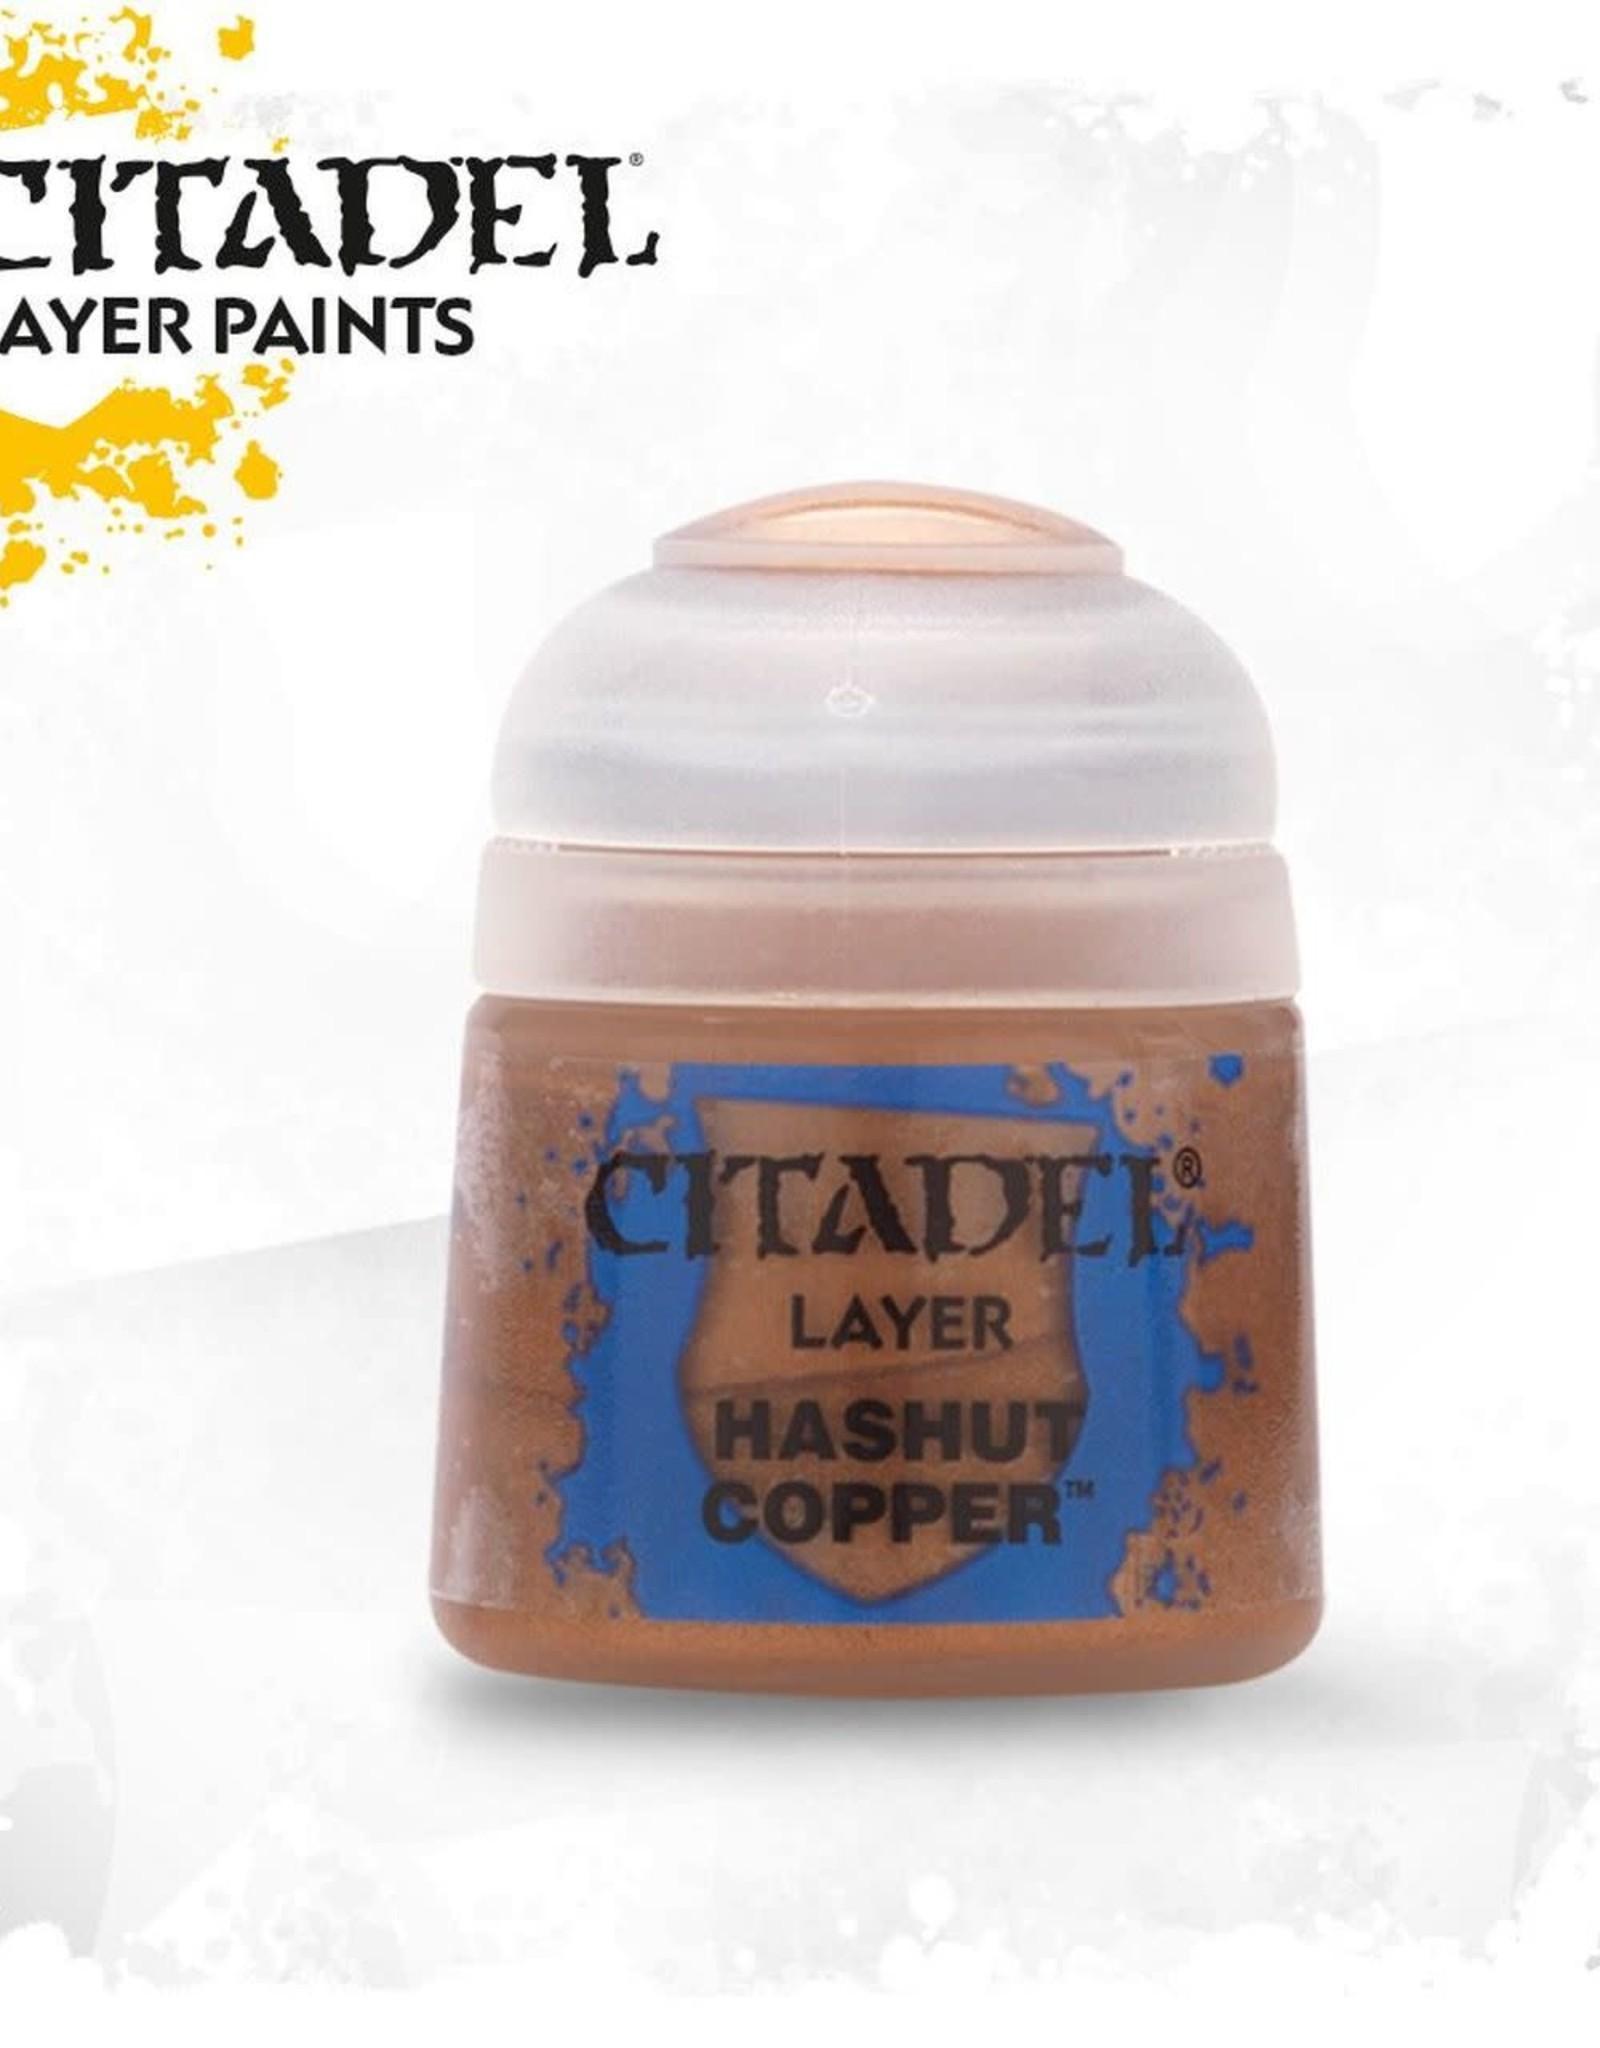 Games Workshop Citadel Paint: Layer - Hashut Copper